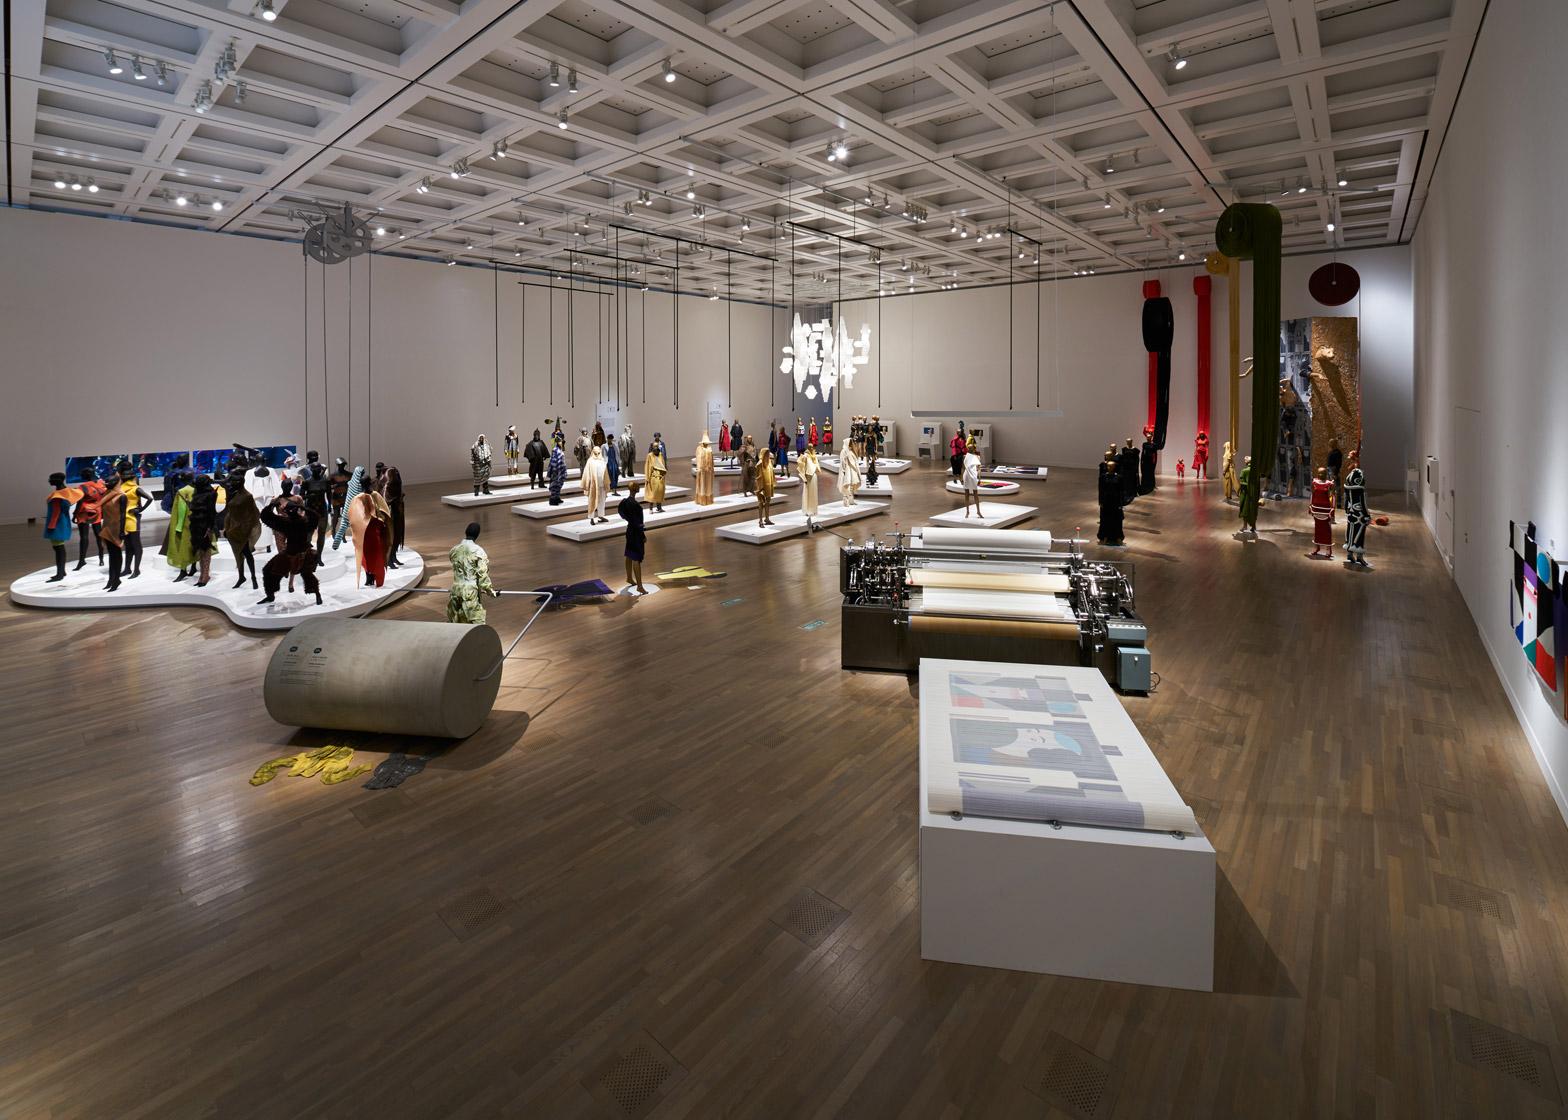 the-work-of-miyake-issey-exhibition-the-national-art-centre-tokyo_dezeen_1568_4.jpg